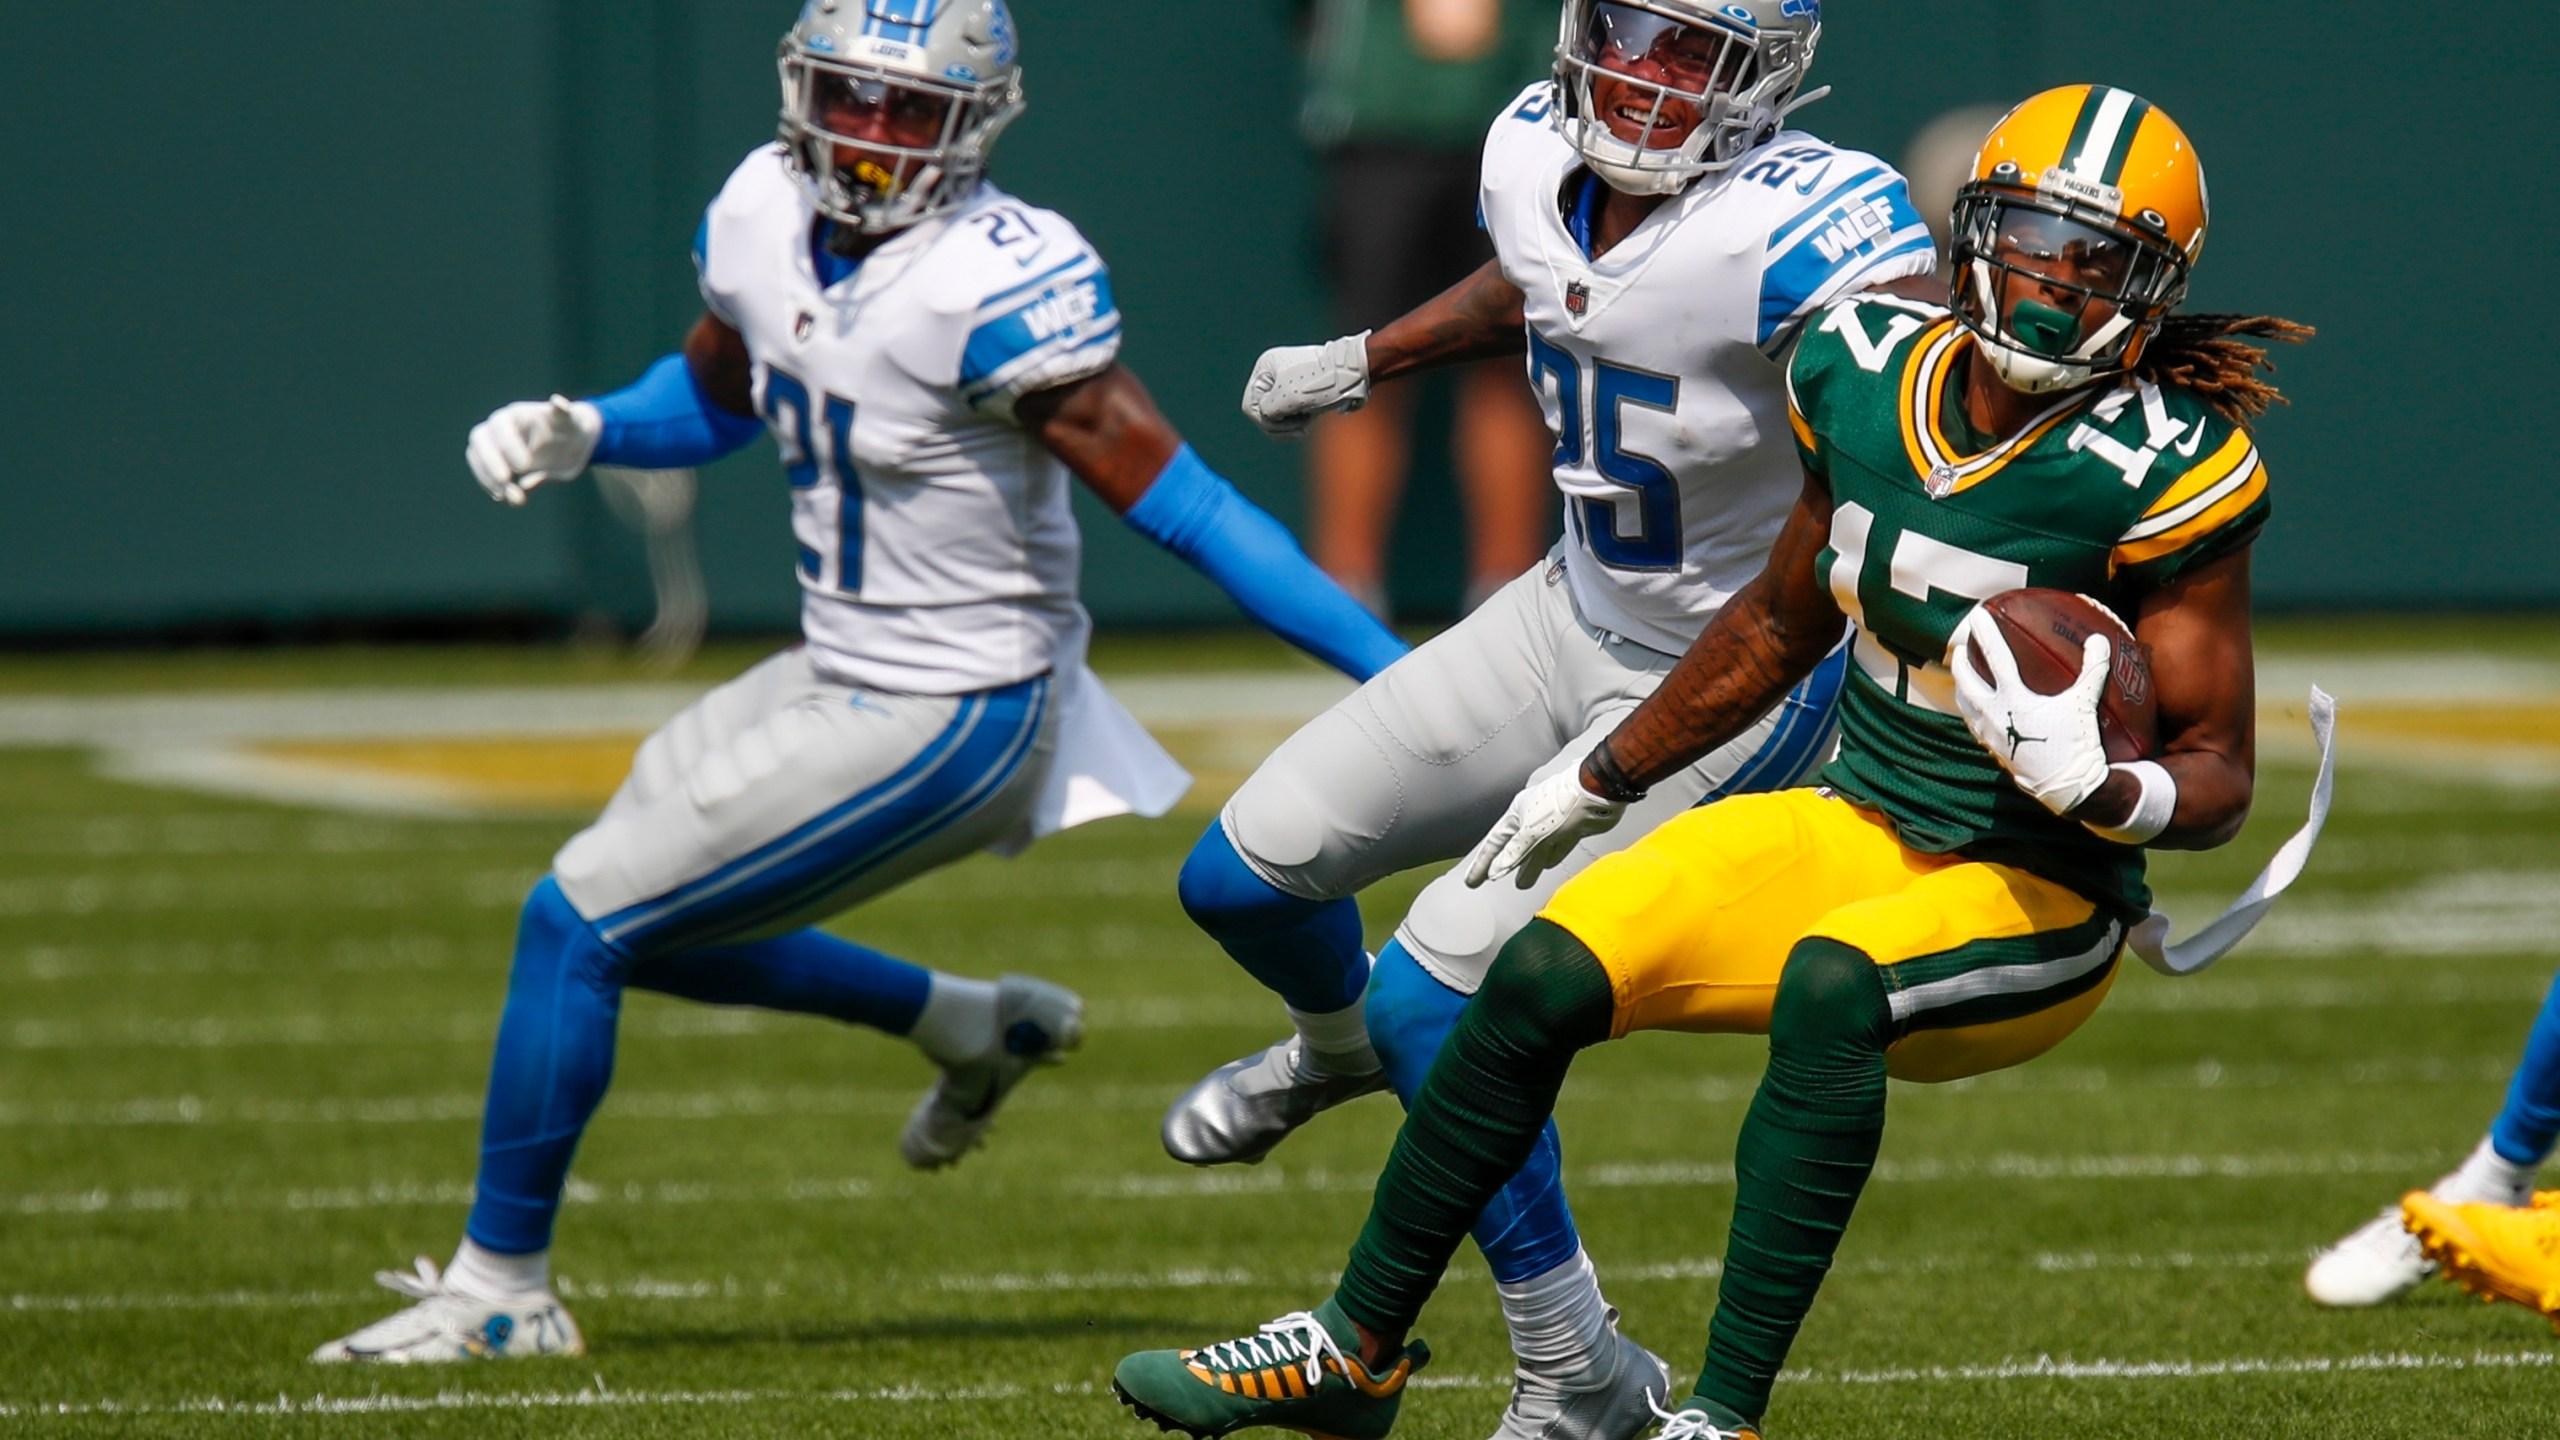 Packers Davante Adams Unsure Of His Status For Saints Game Wjmn Upmatters Com